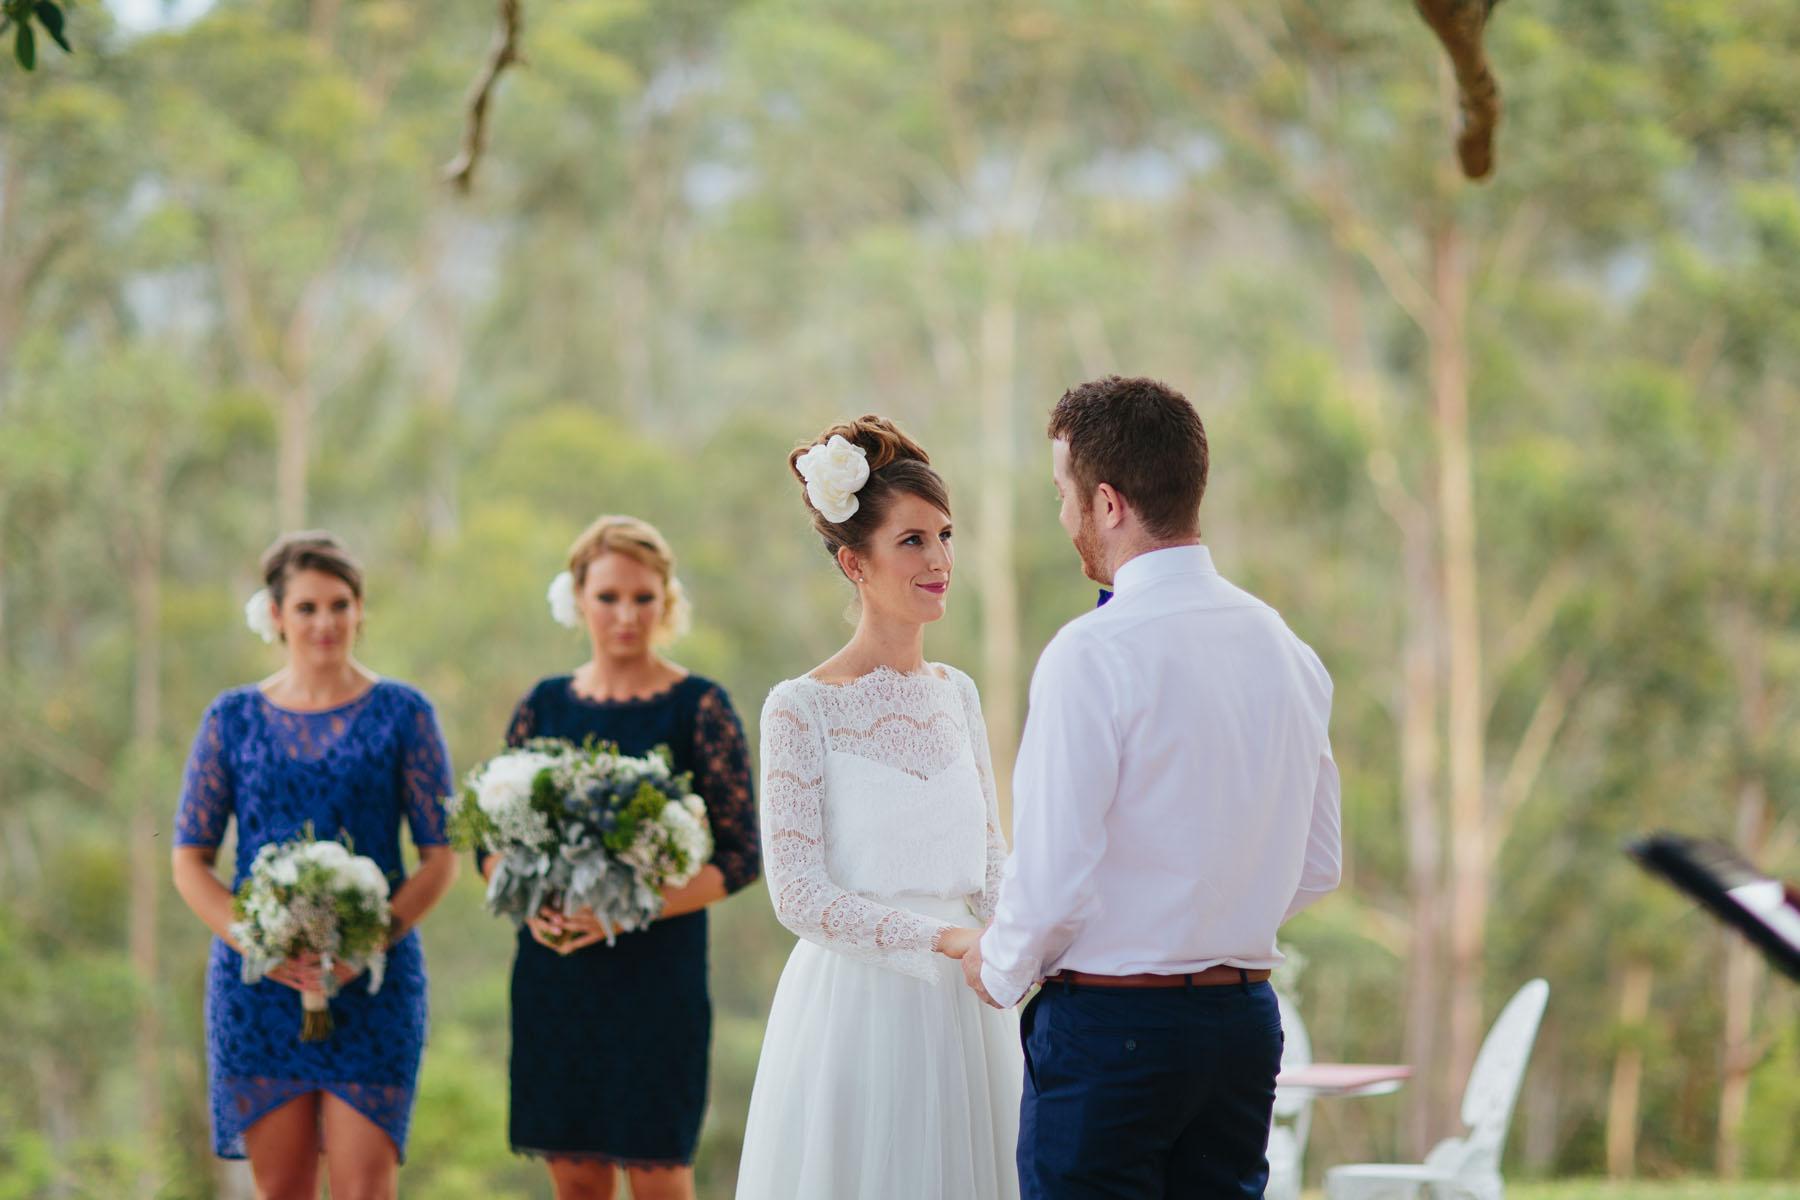 06_midginbill hill wedding .jpg